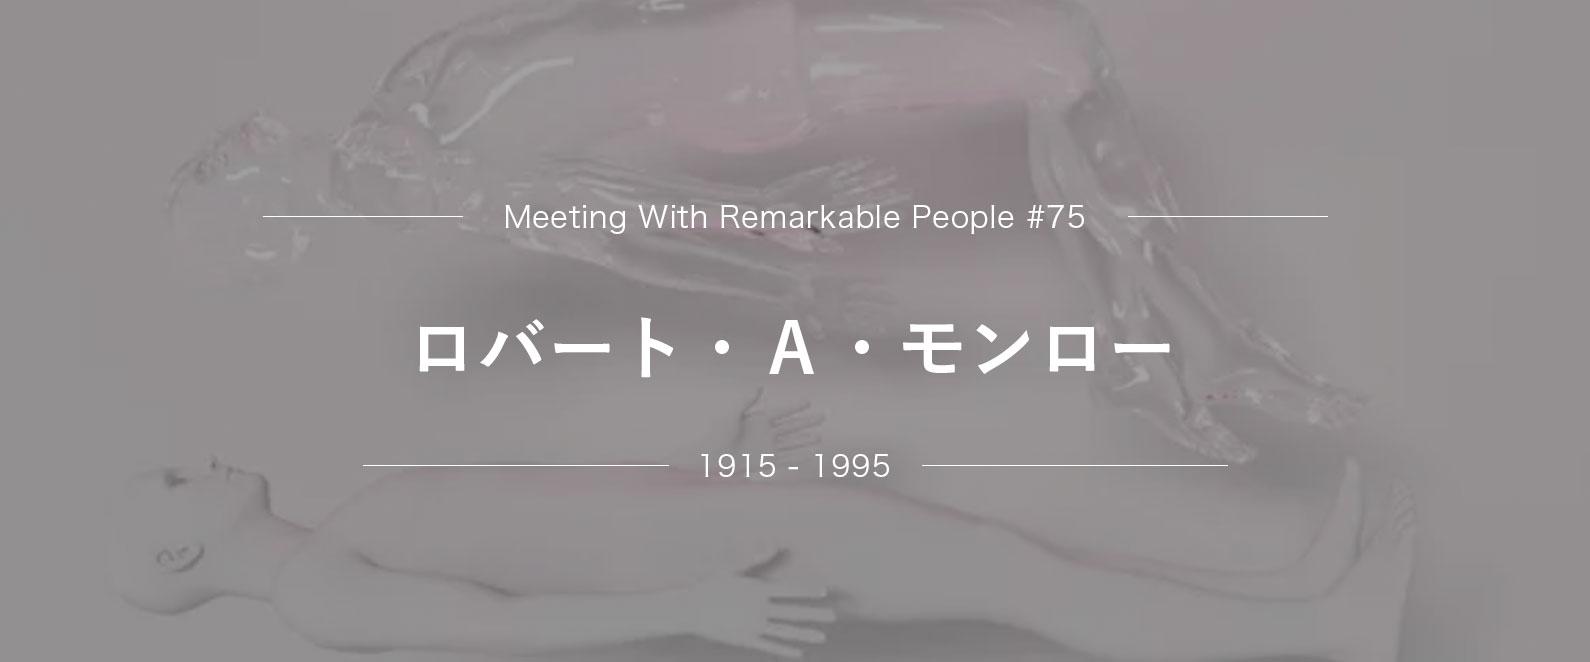 BookClubKAI Storeimg01